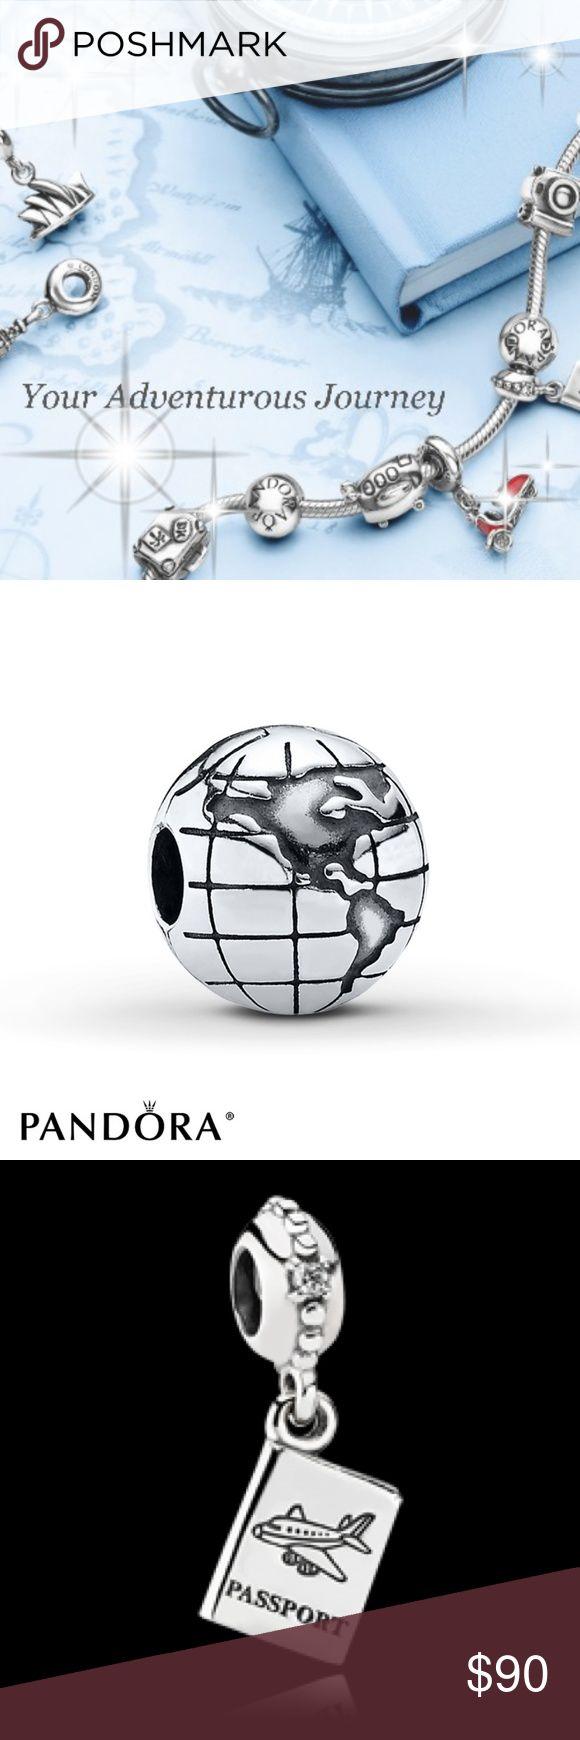 NEW TRAVEL ADVENTURE PANDORA GIFT SET NEW TRAVEL ADVENTURE PANDORA GIFT SET PANDORA GLOBE CLIP, PANDORA PASSPORT,  PANDORA SUITCASE TRAVEL ADVENTURE SET. Pandora Jewelry Bracelets